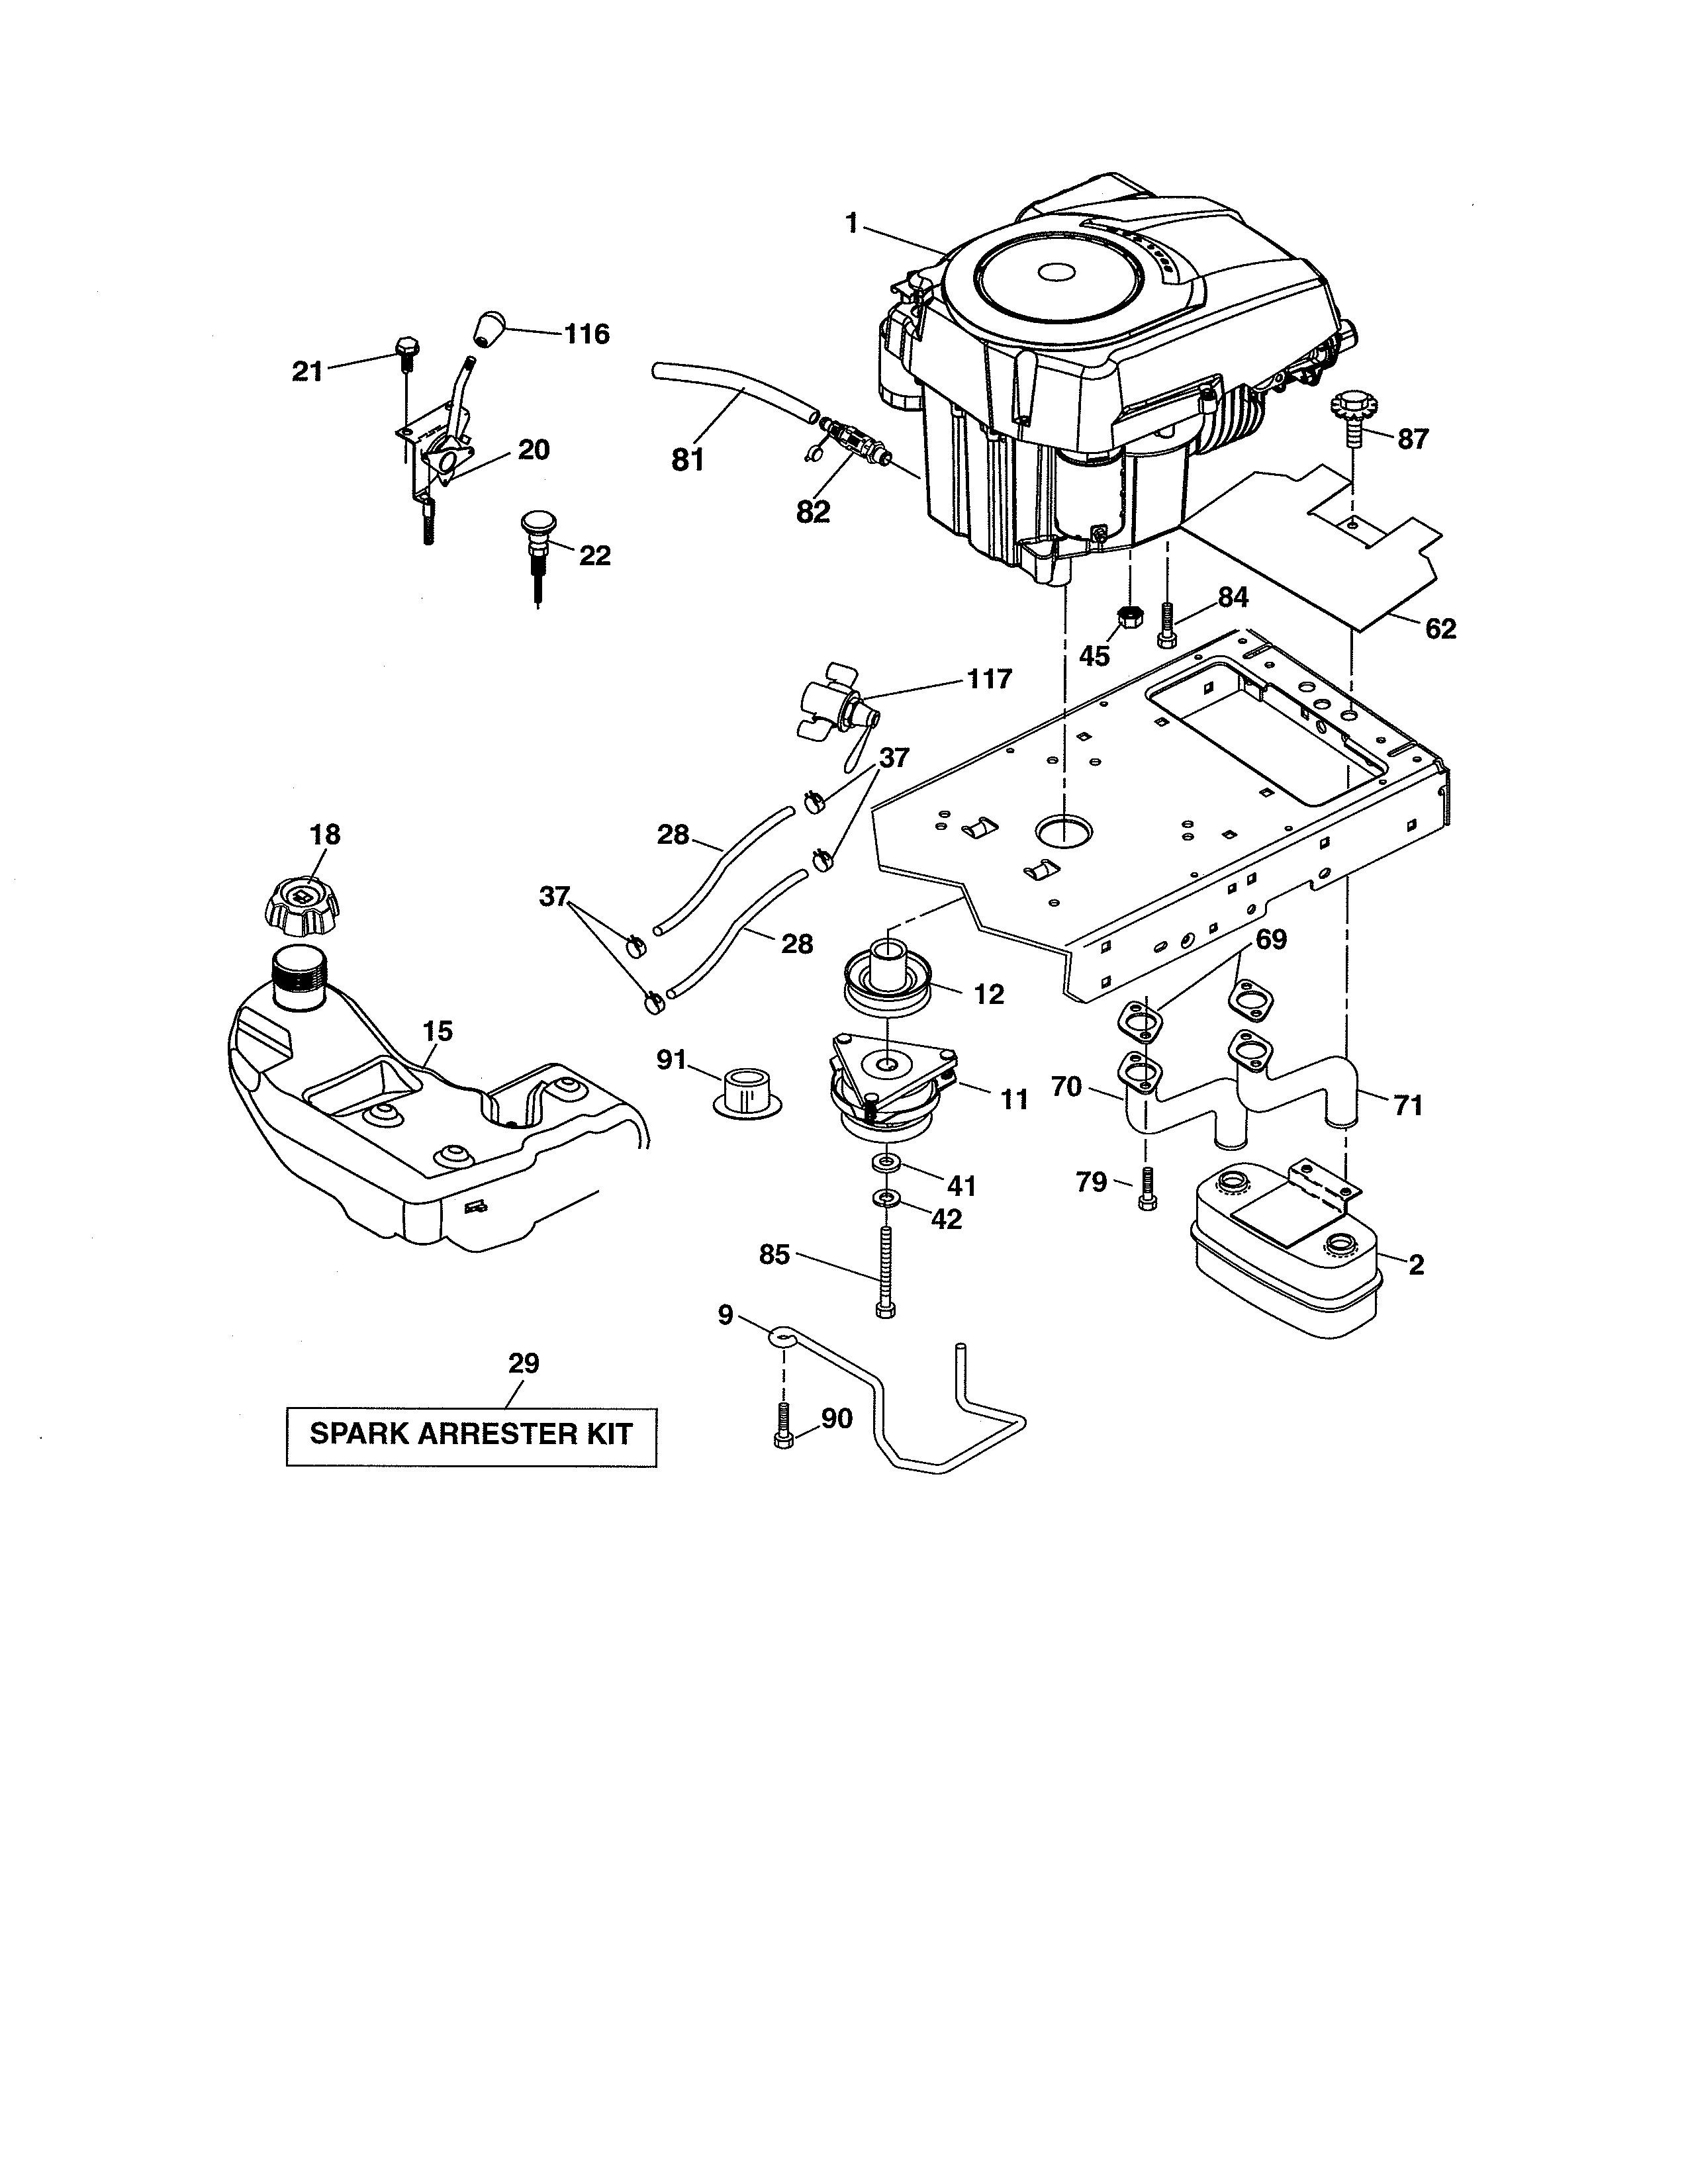 Craftsman Leaf Blower Parts Diagram Craftsman Model Lawn Tractor Genuine Parts Of Craftsman Leaf Blower Parts Diagram